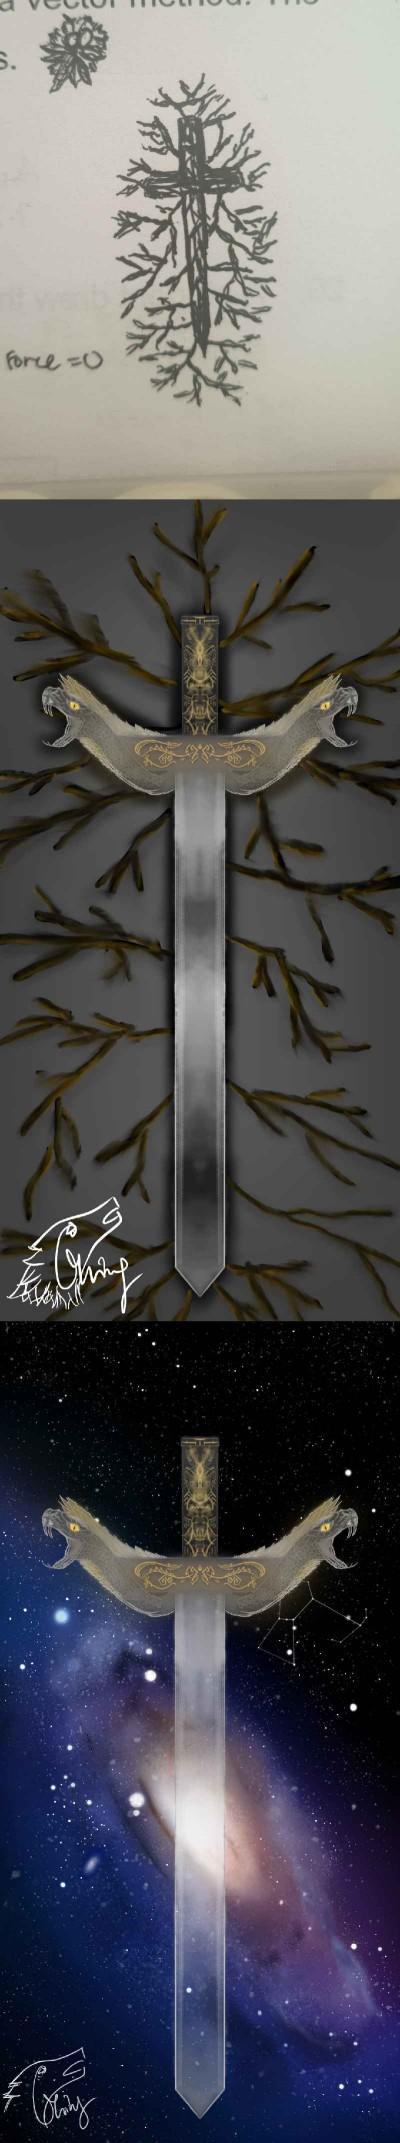 Drakein Arc    Yuning   Digital Drawing   PENUP